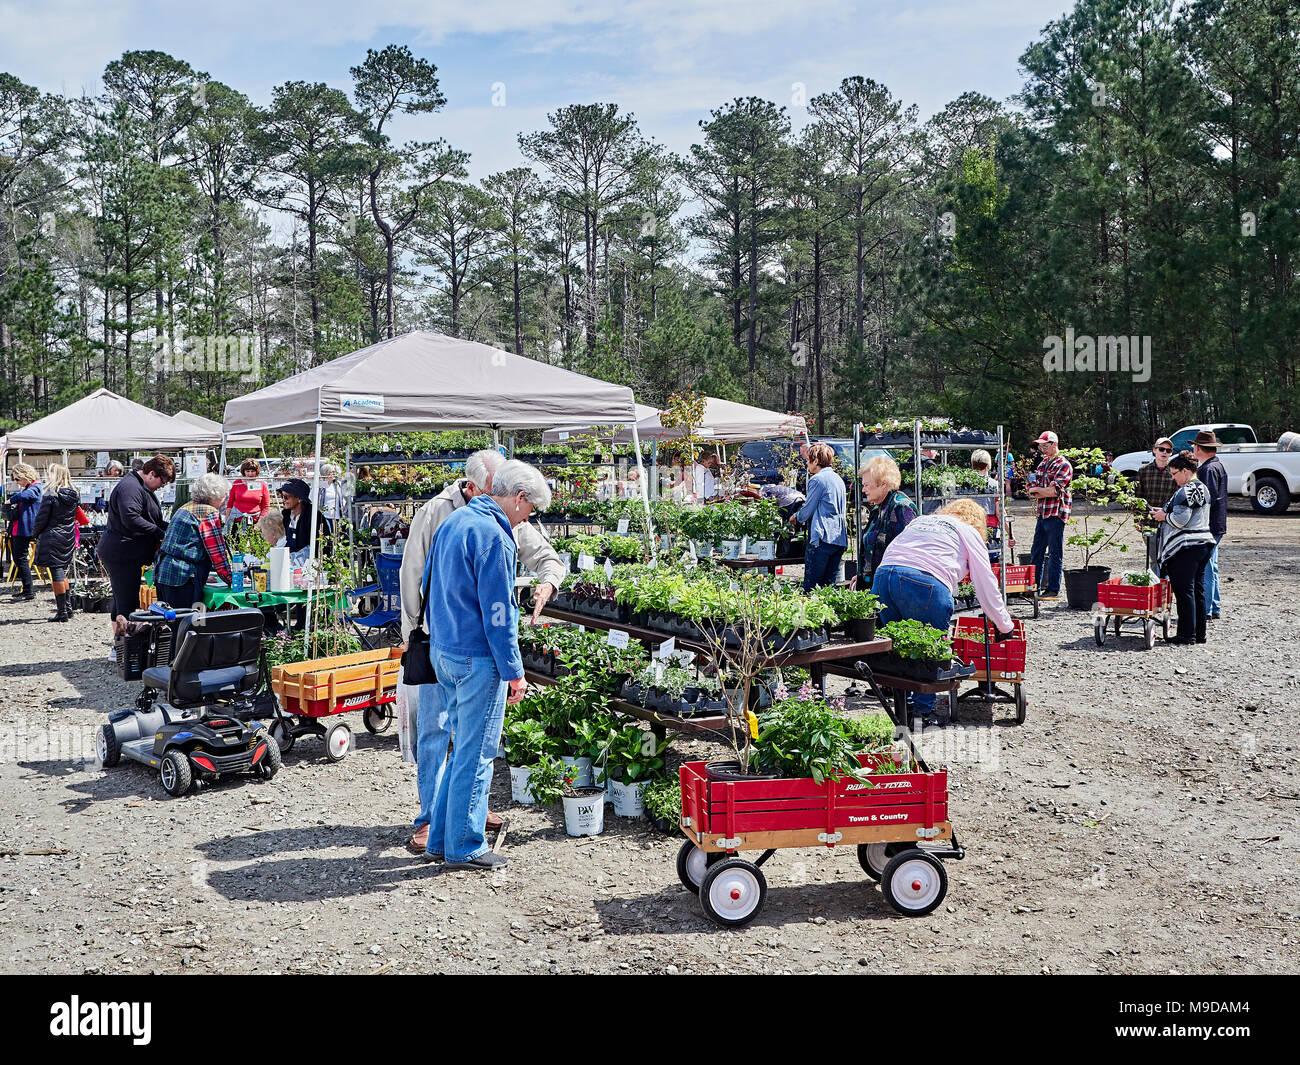 Senior elderly, mature couple shopping for garden plants at the outdoor Spring plant sale in Callaway Gardens, Pine Mountain Georgia, USA. - Stock Image